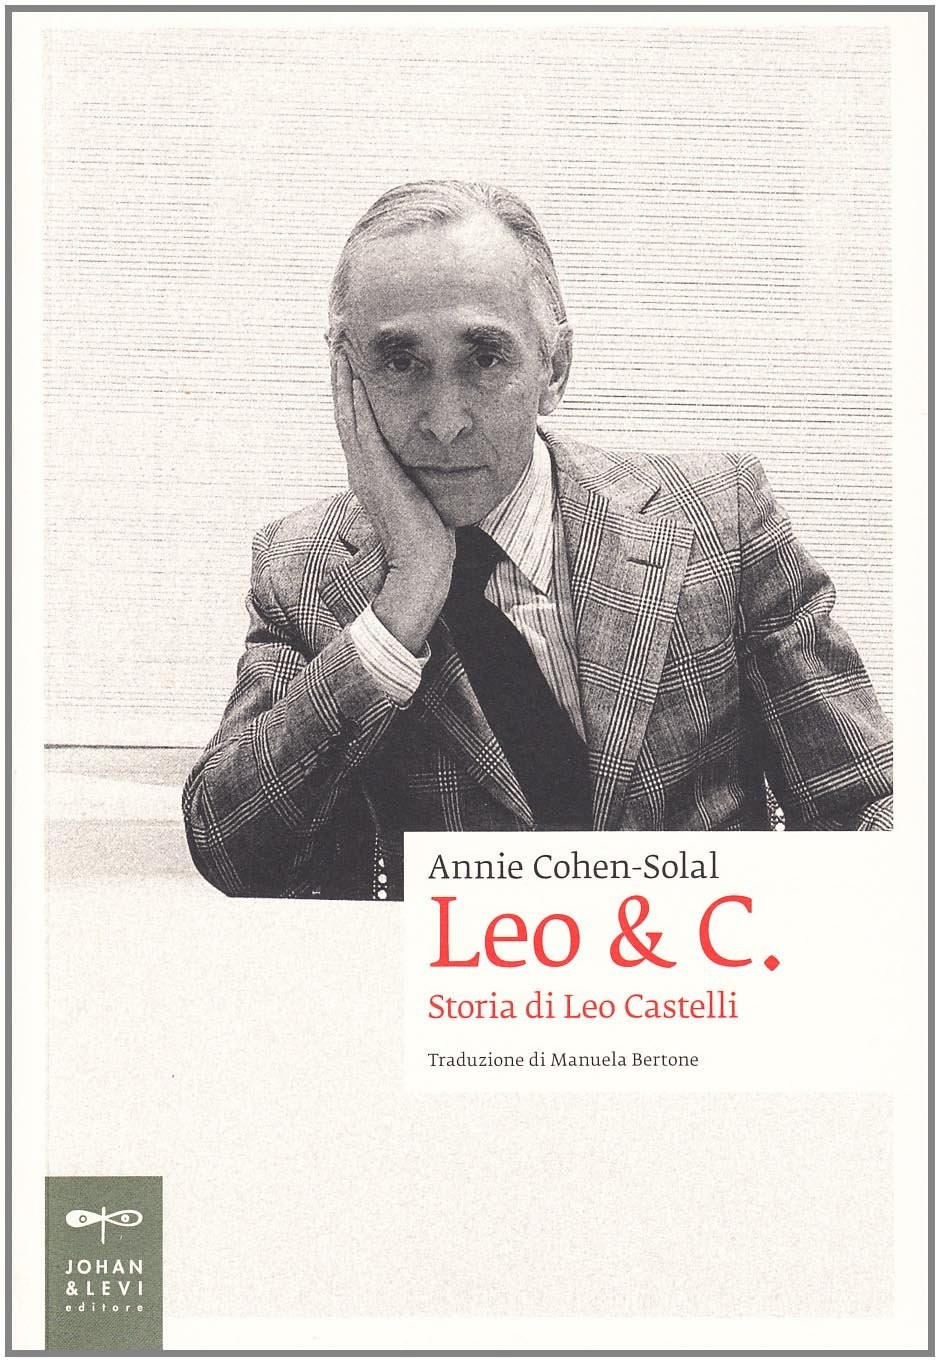 LEO & C. STORIA DI LEO CASTELLI